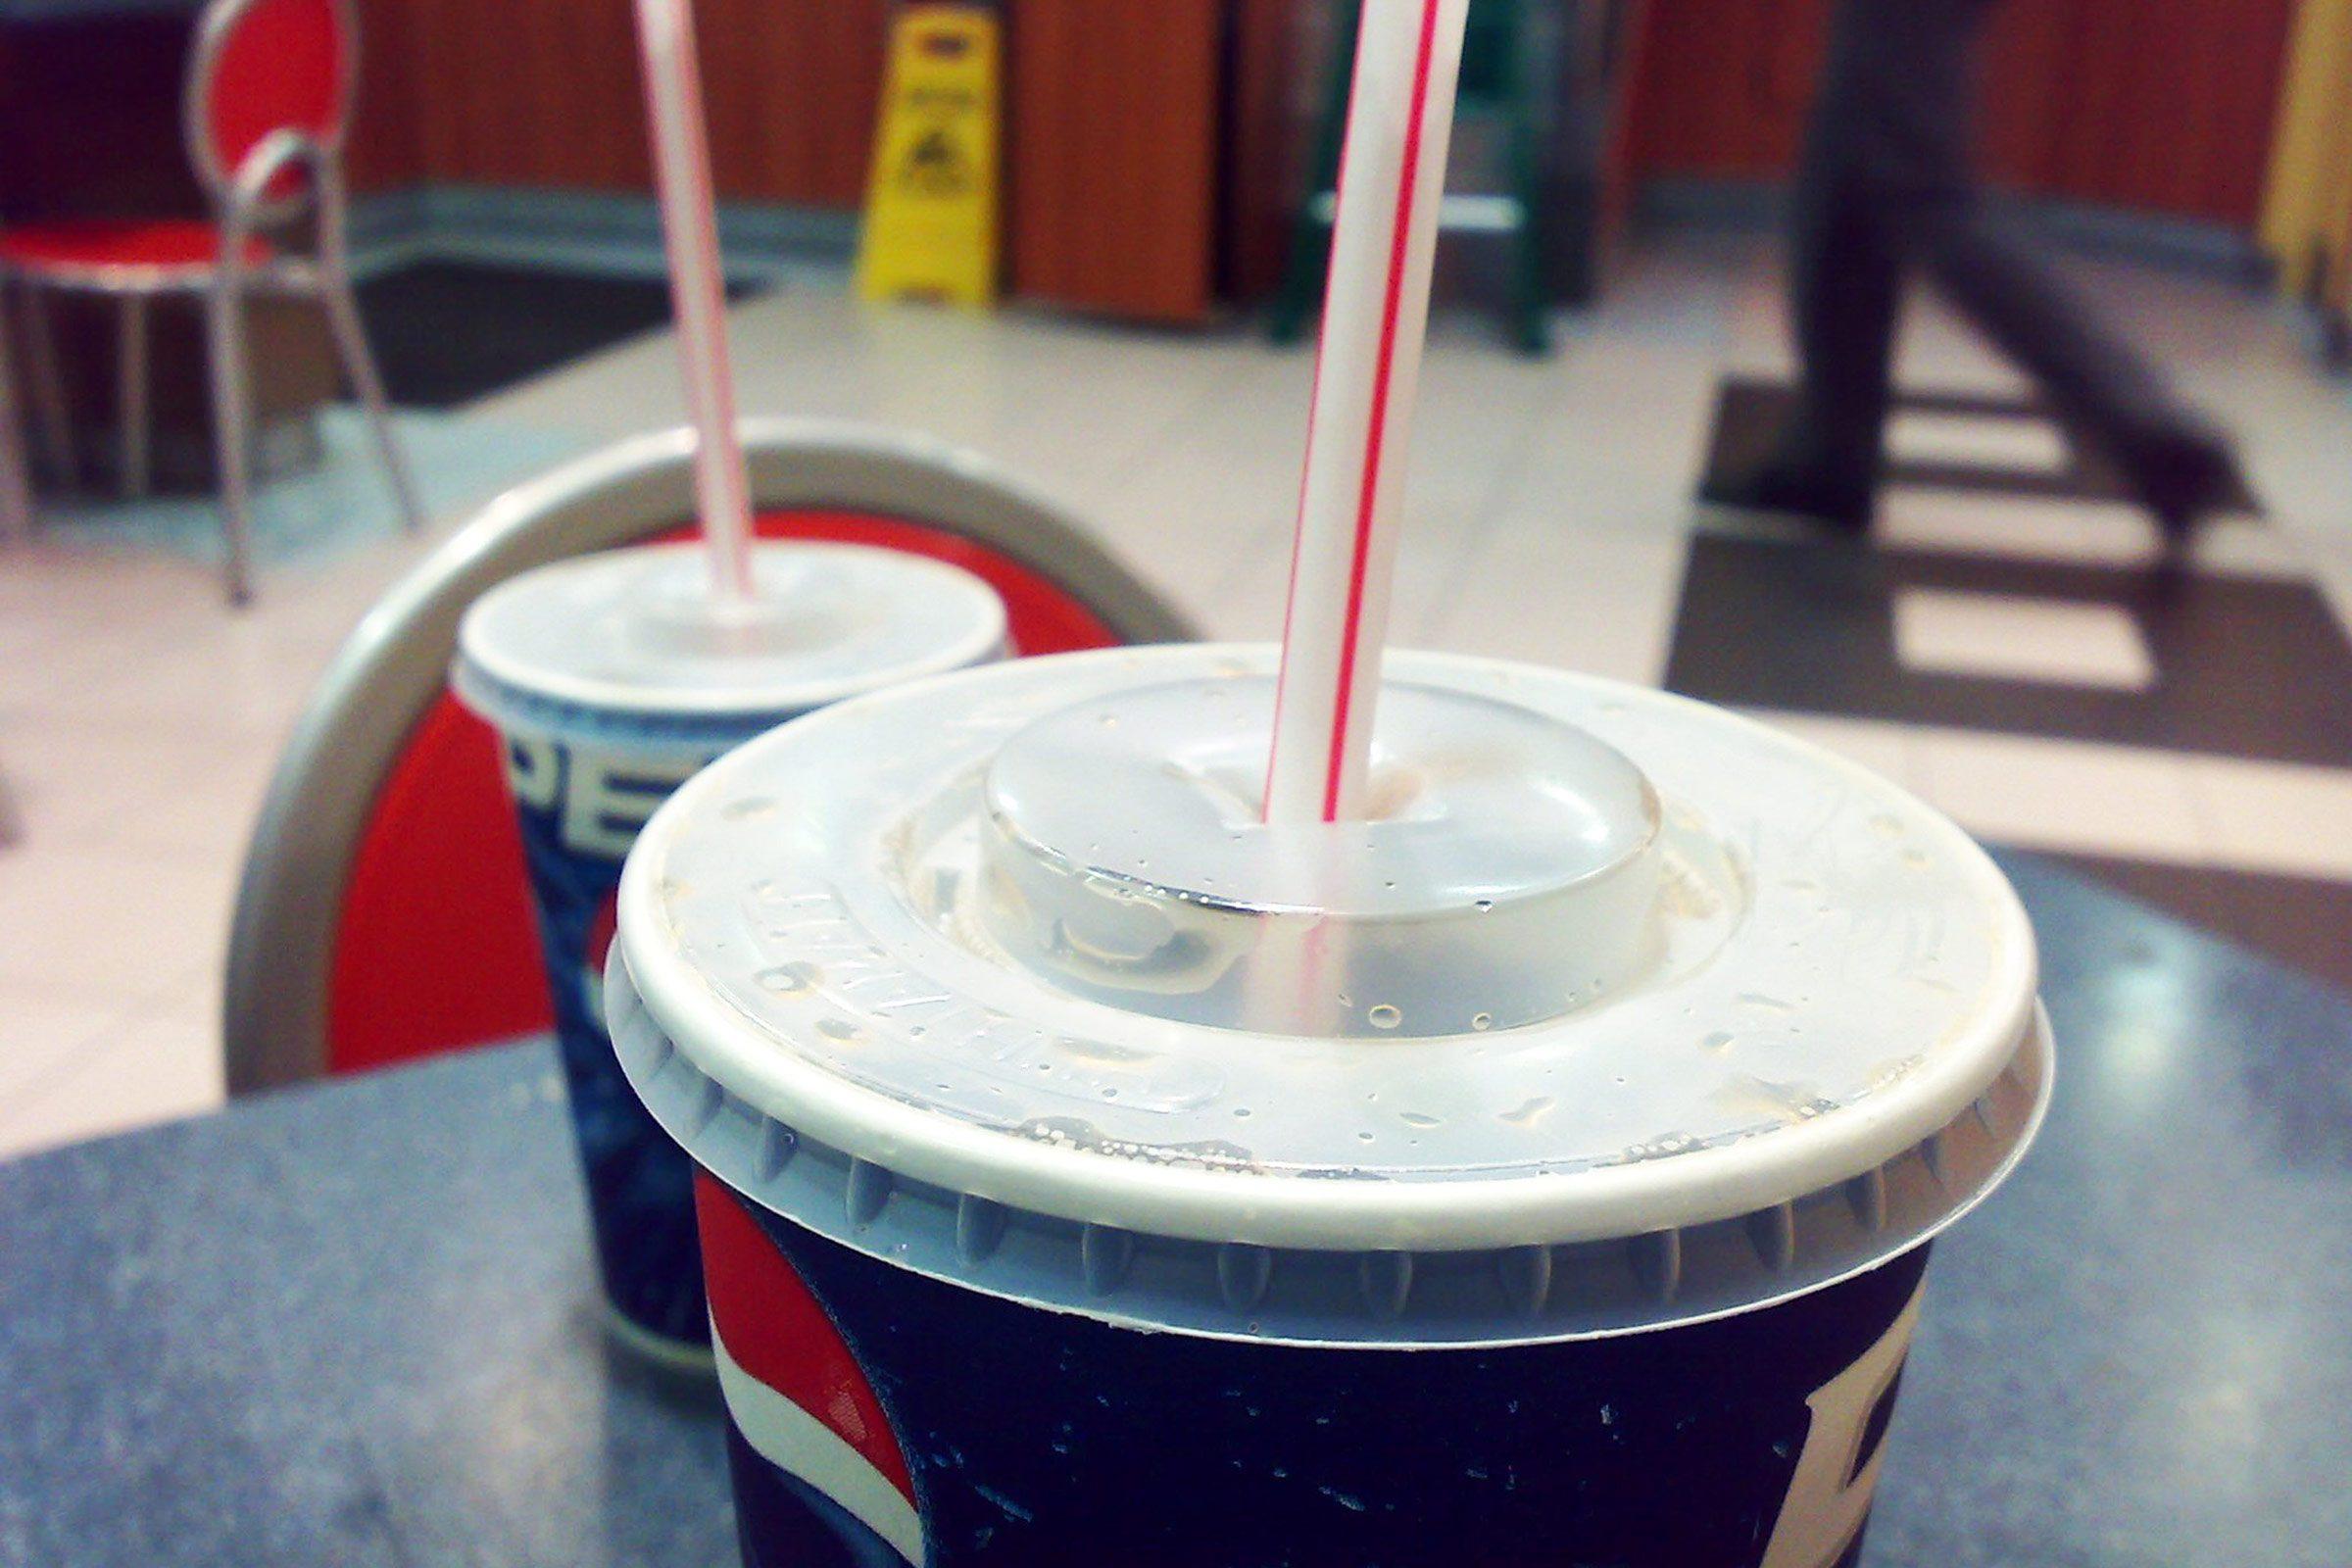 KFC's 64-Ounce Pepsi